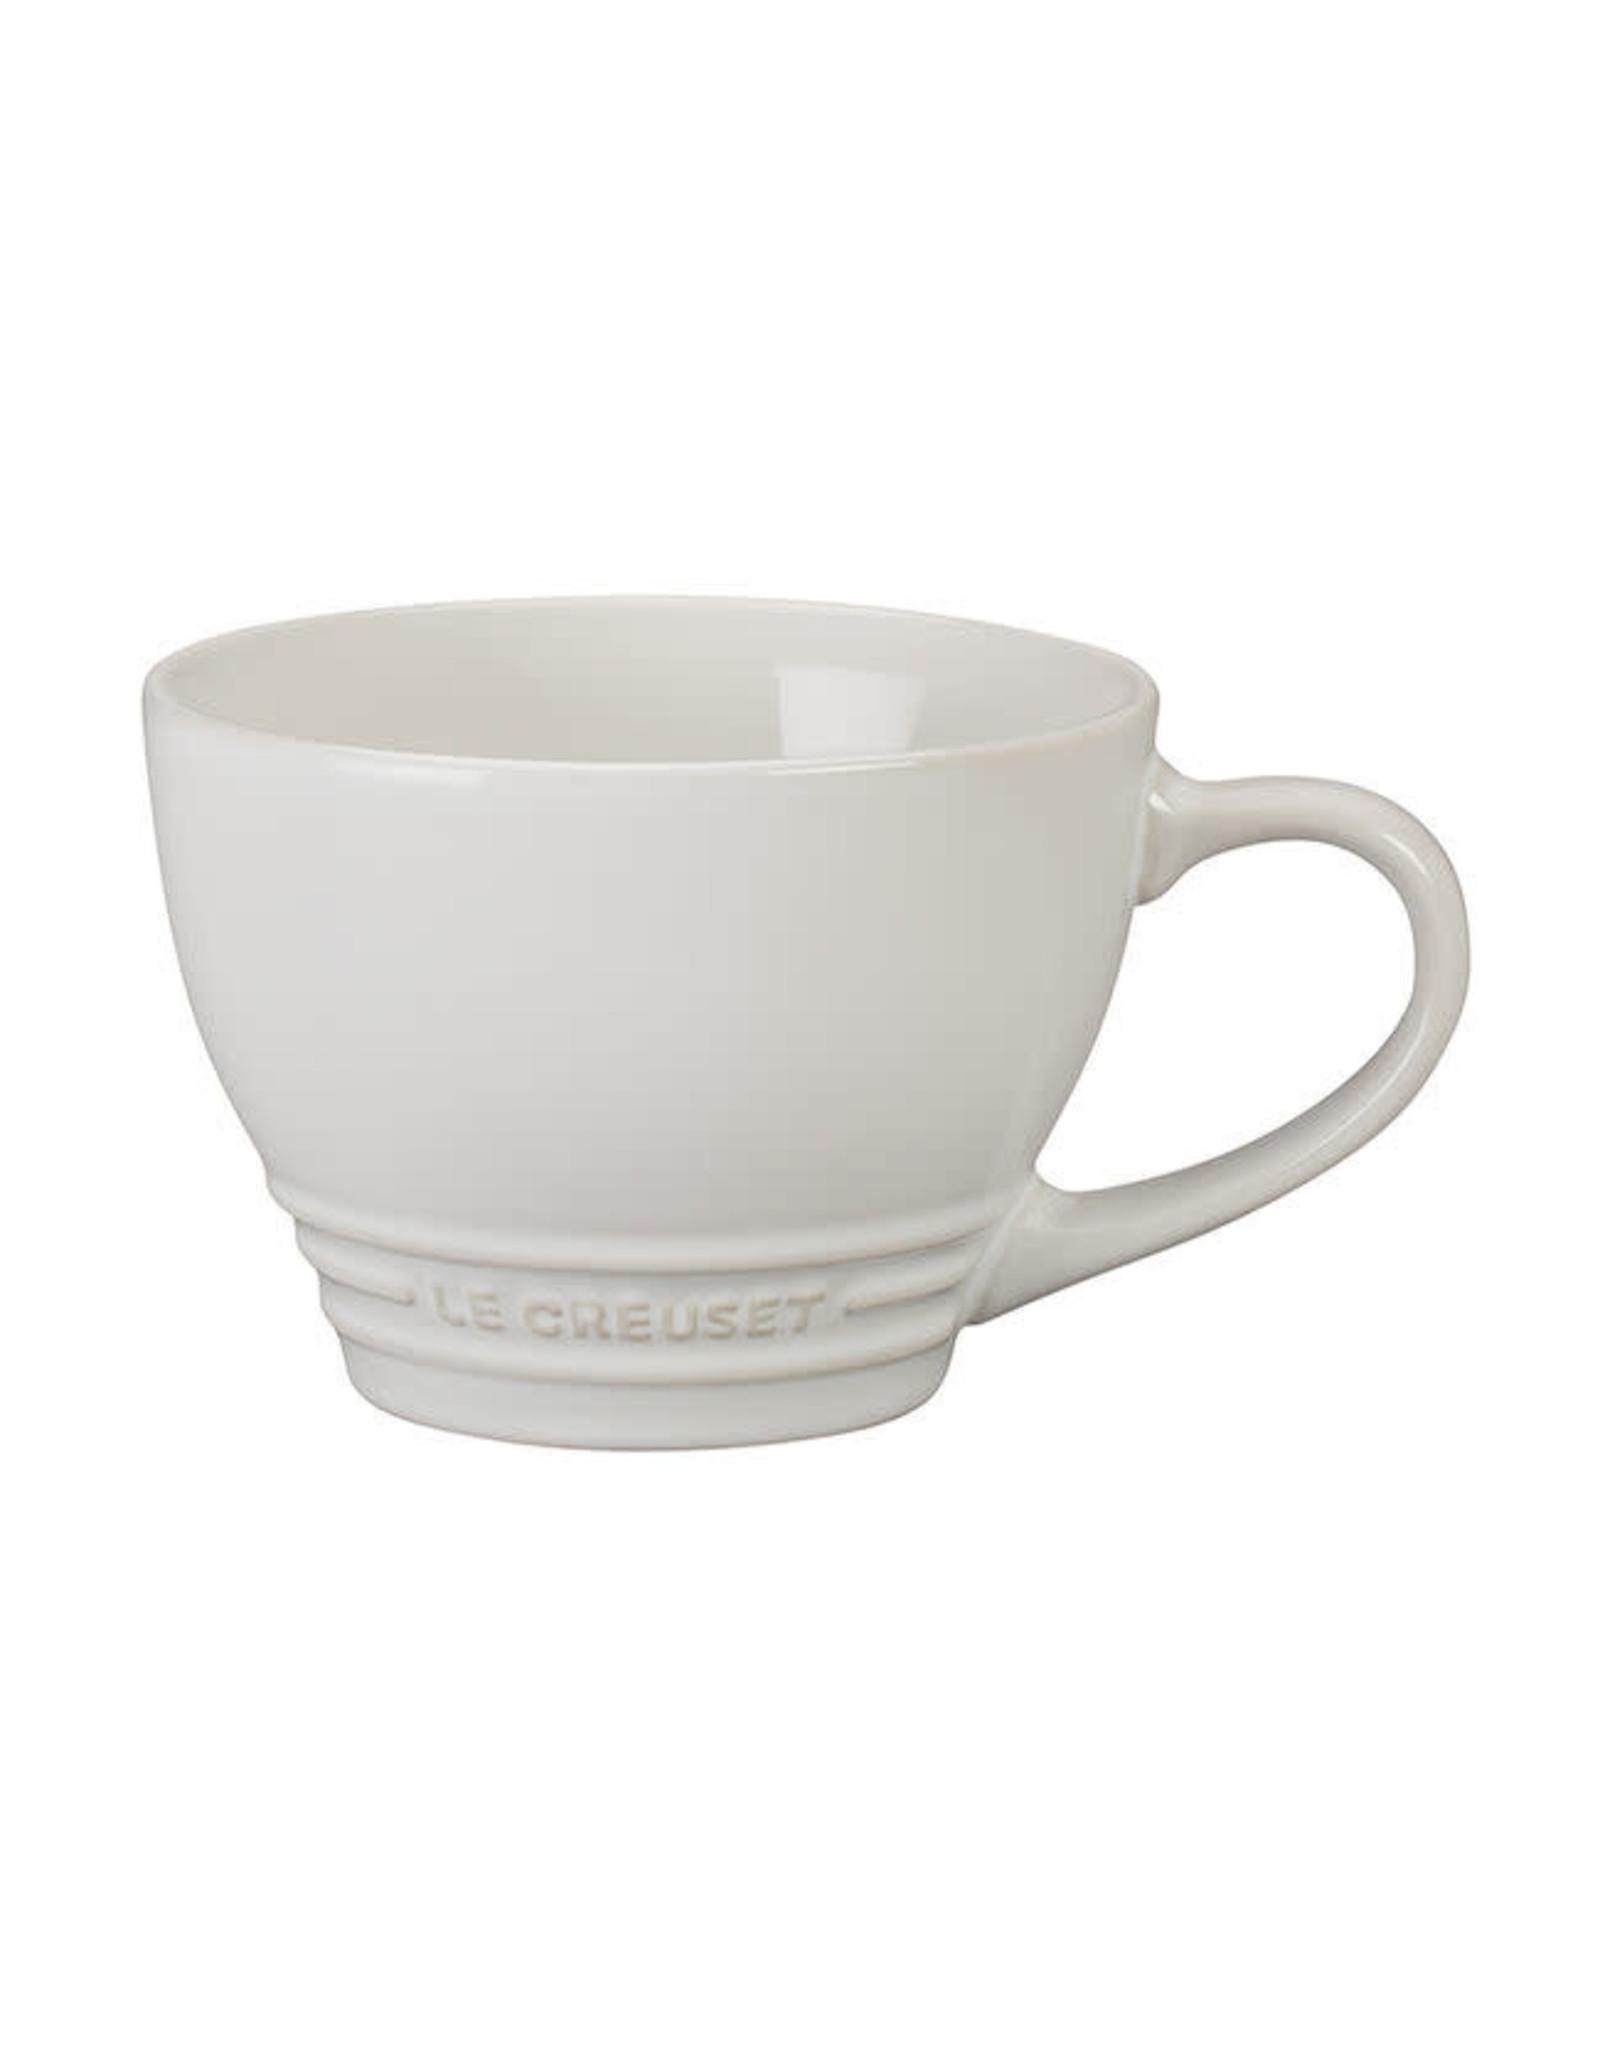 Le Creuset LE CREUSET- Bristro Mug 14oz White